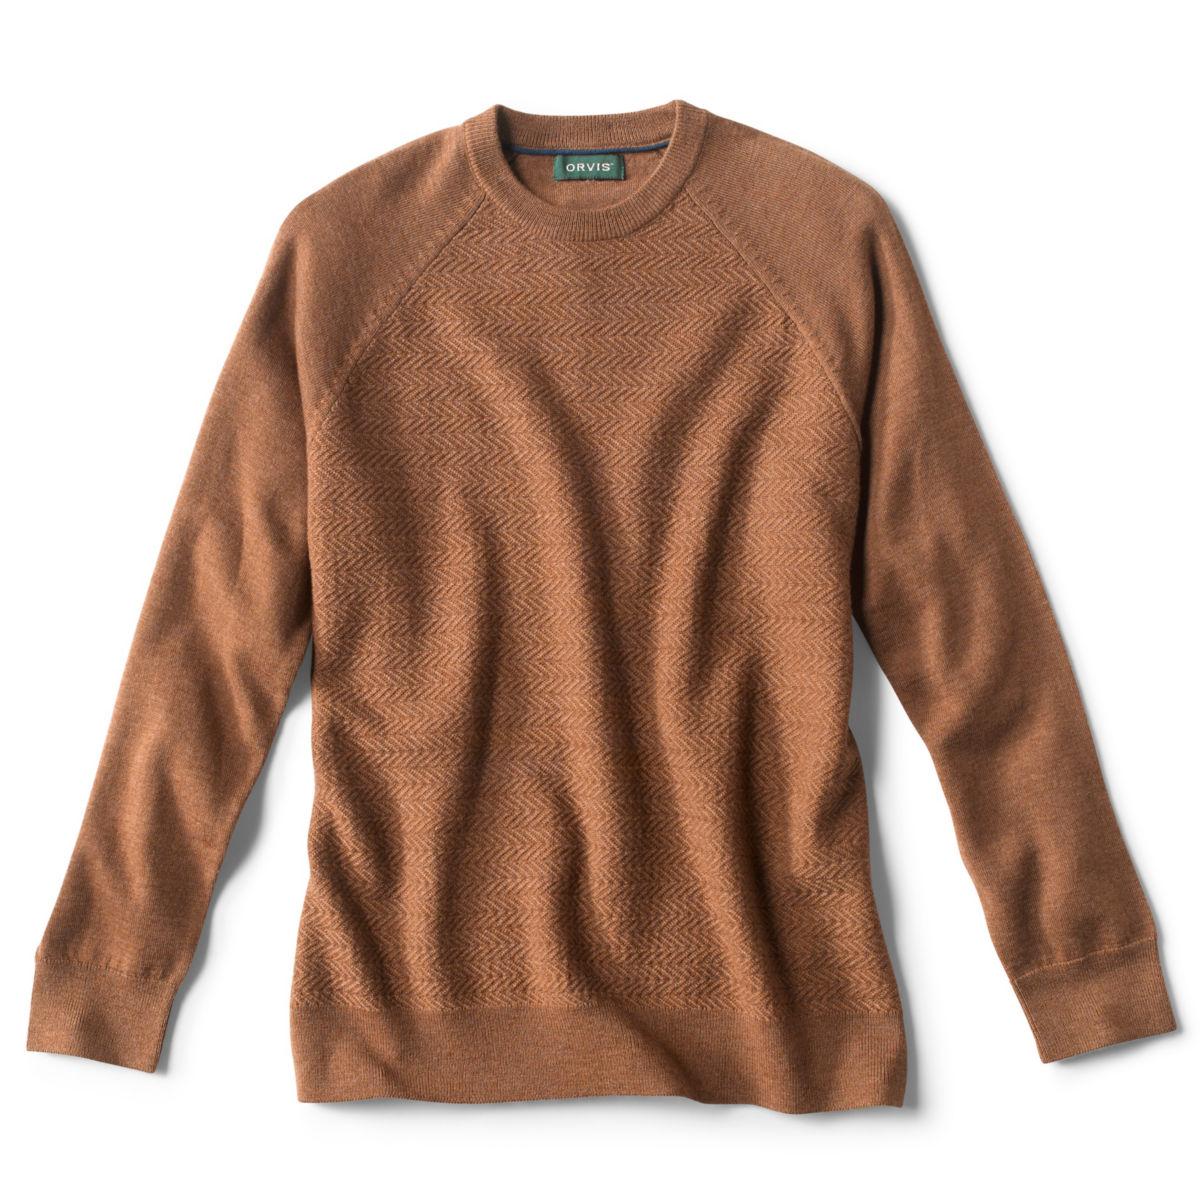 Textured Herringbone Crewneck Sweater - CAMELimage number 0